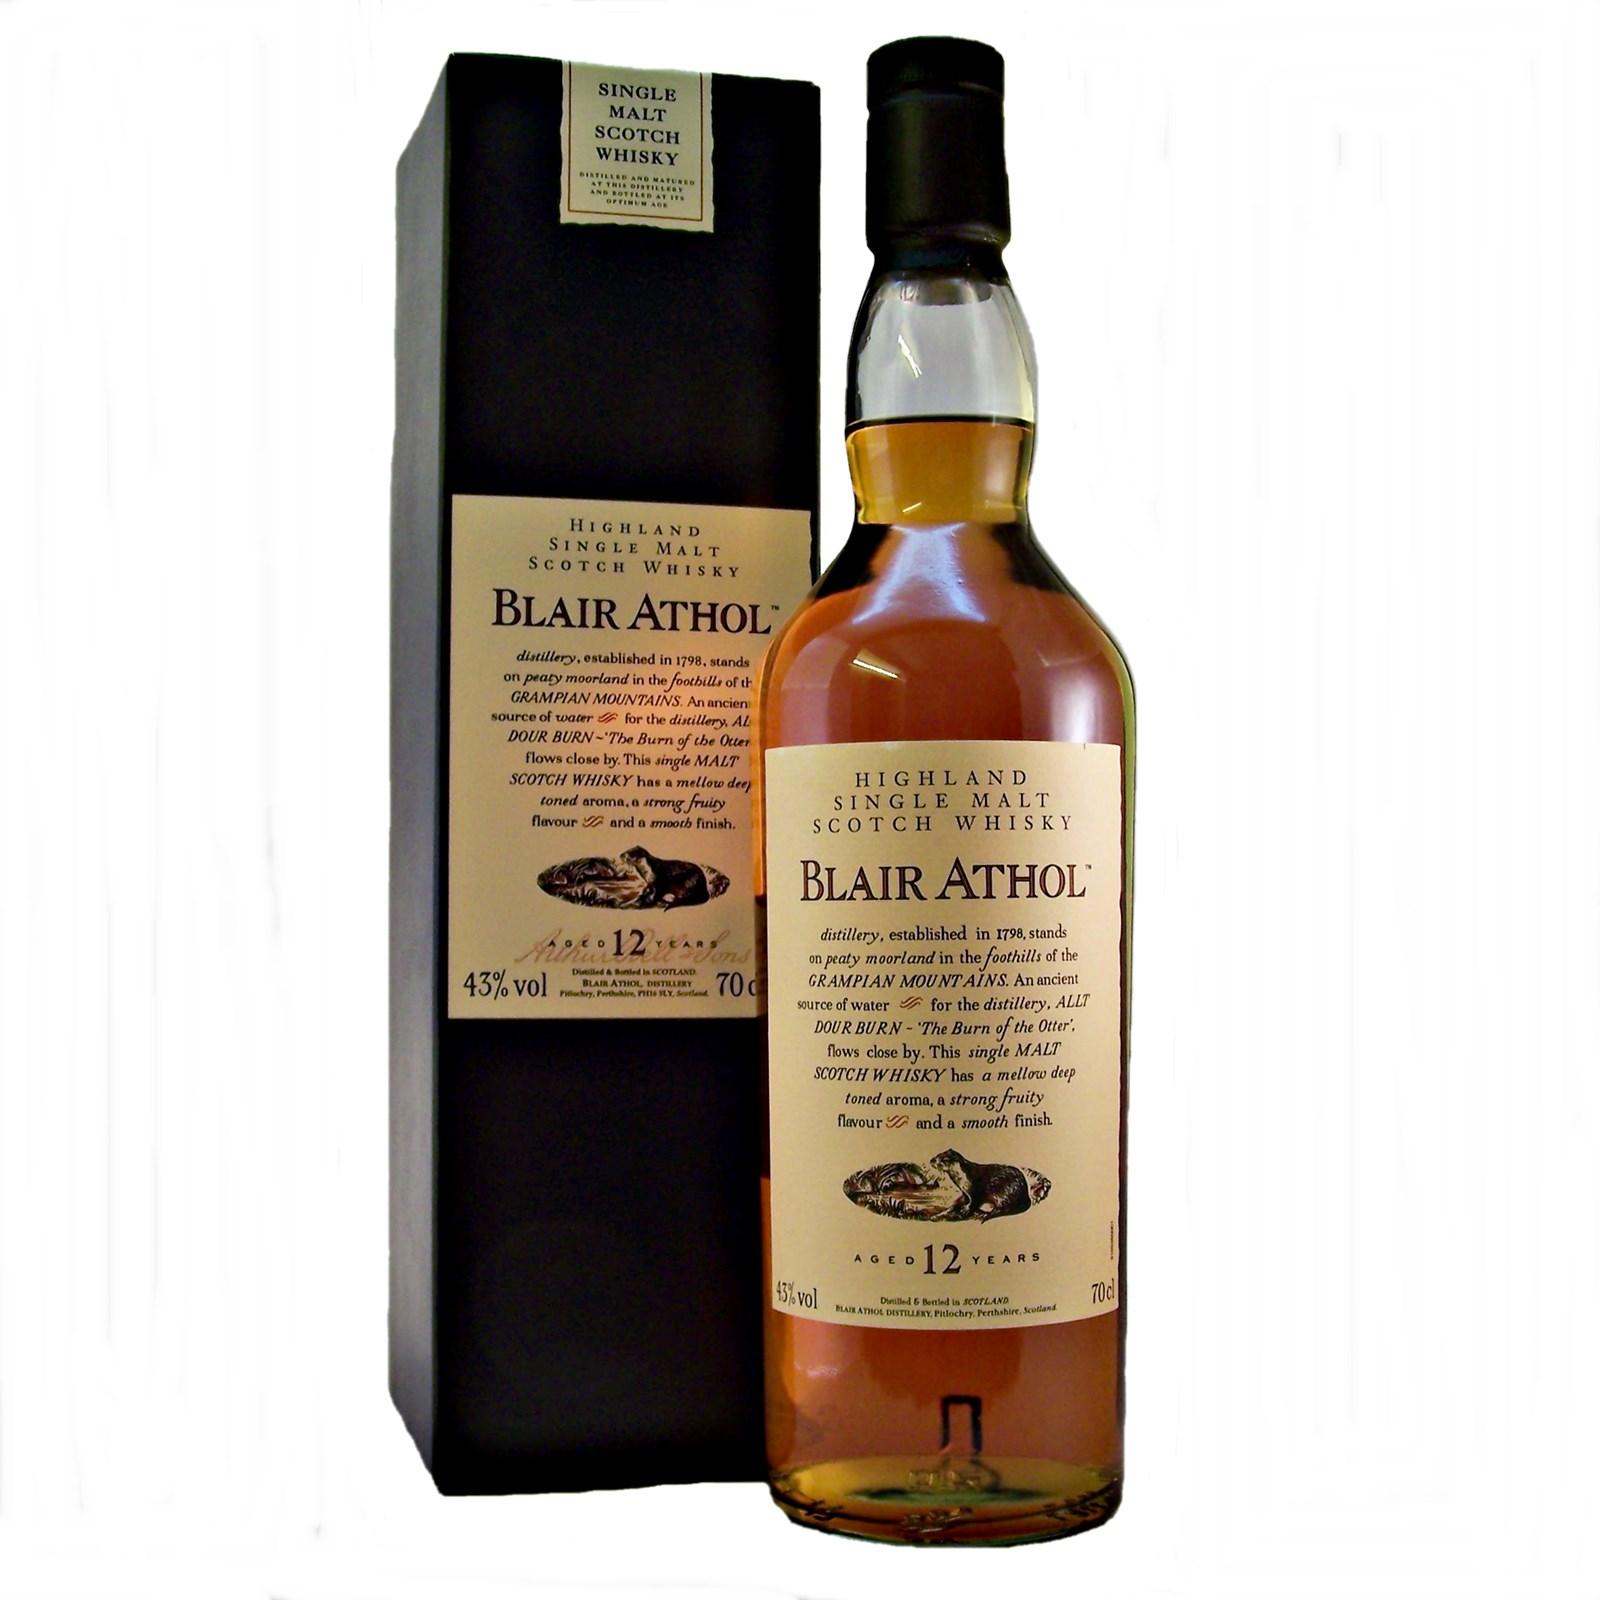 Blair Athol 12 Year Old Whisky